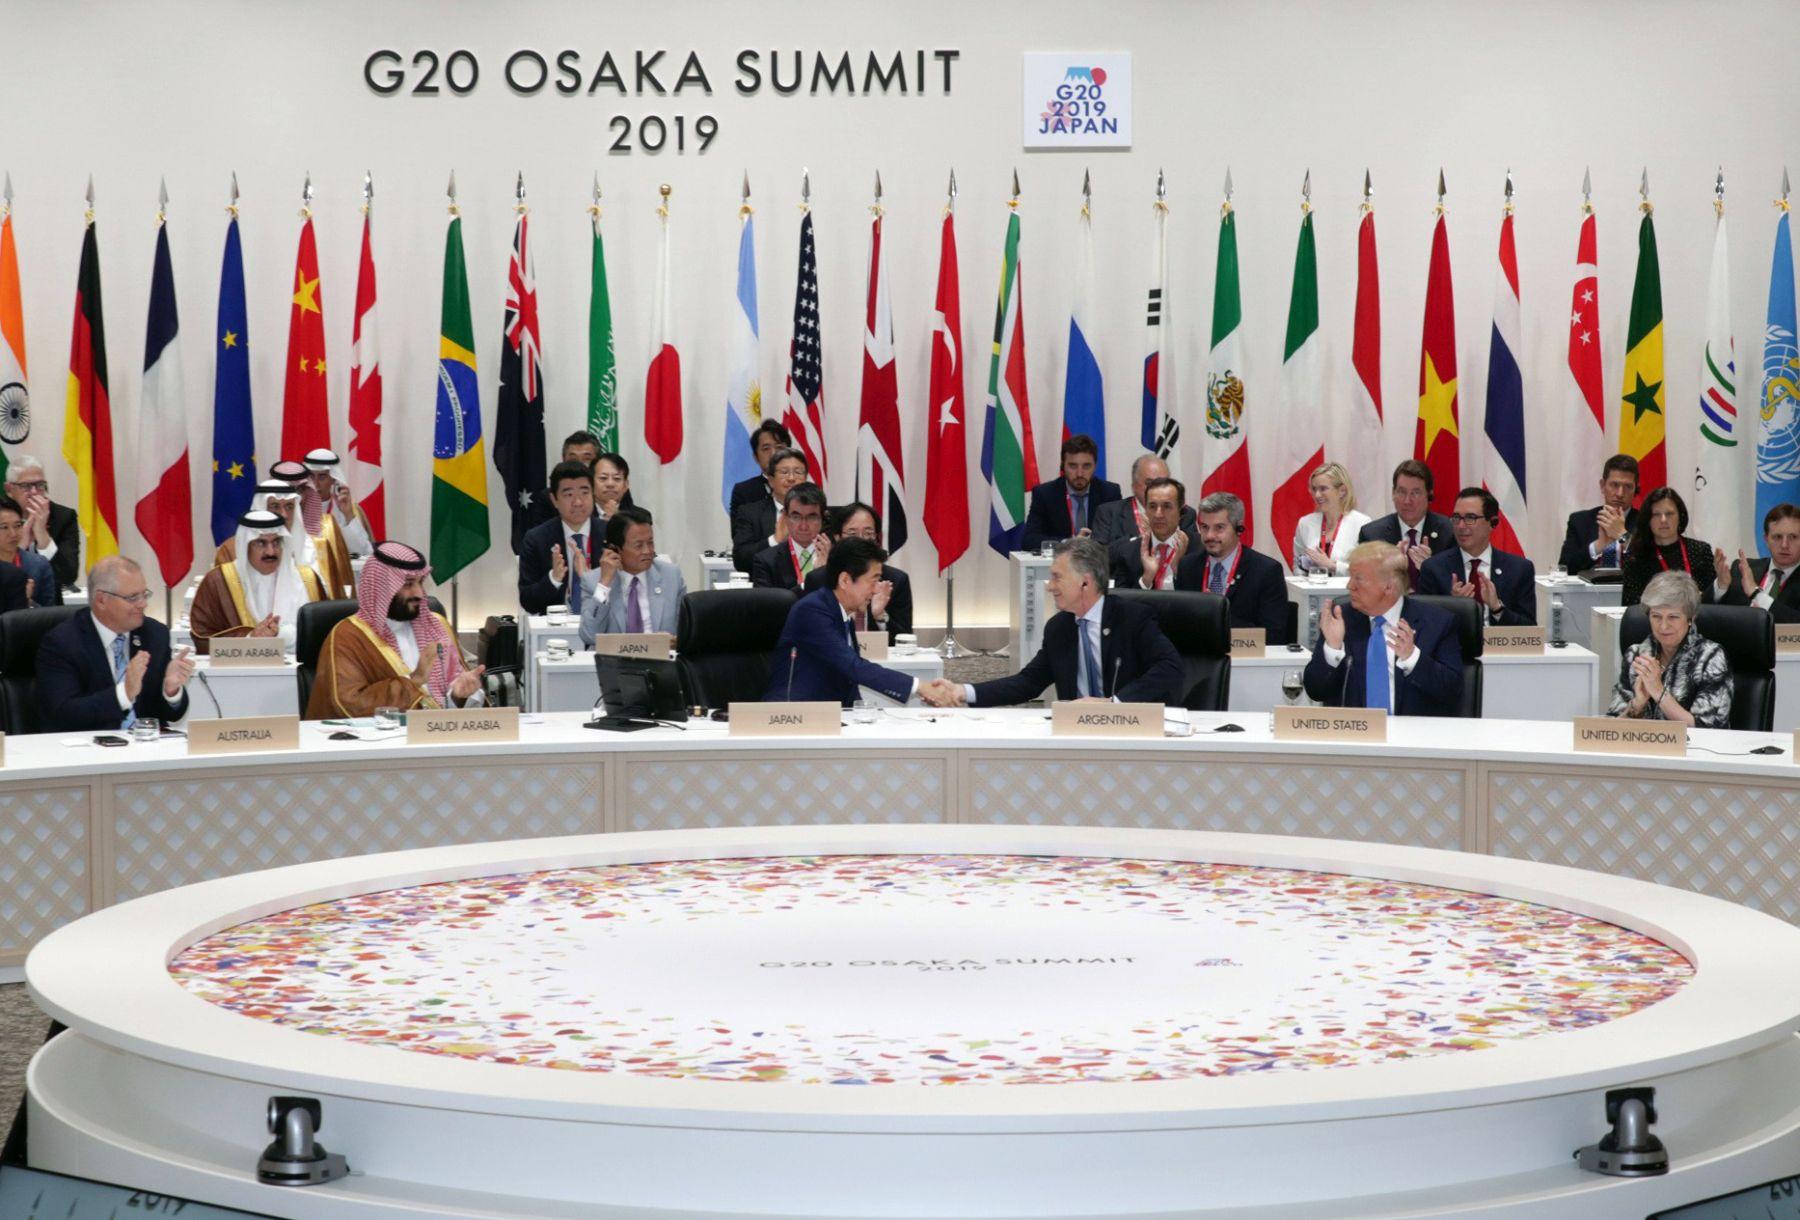 Japan Osaka G20 Summit Day 2 Part 1 032